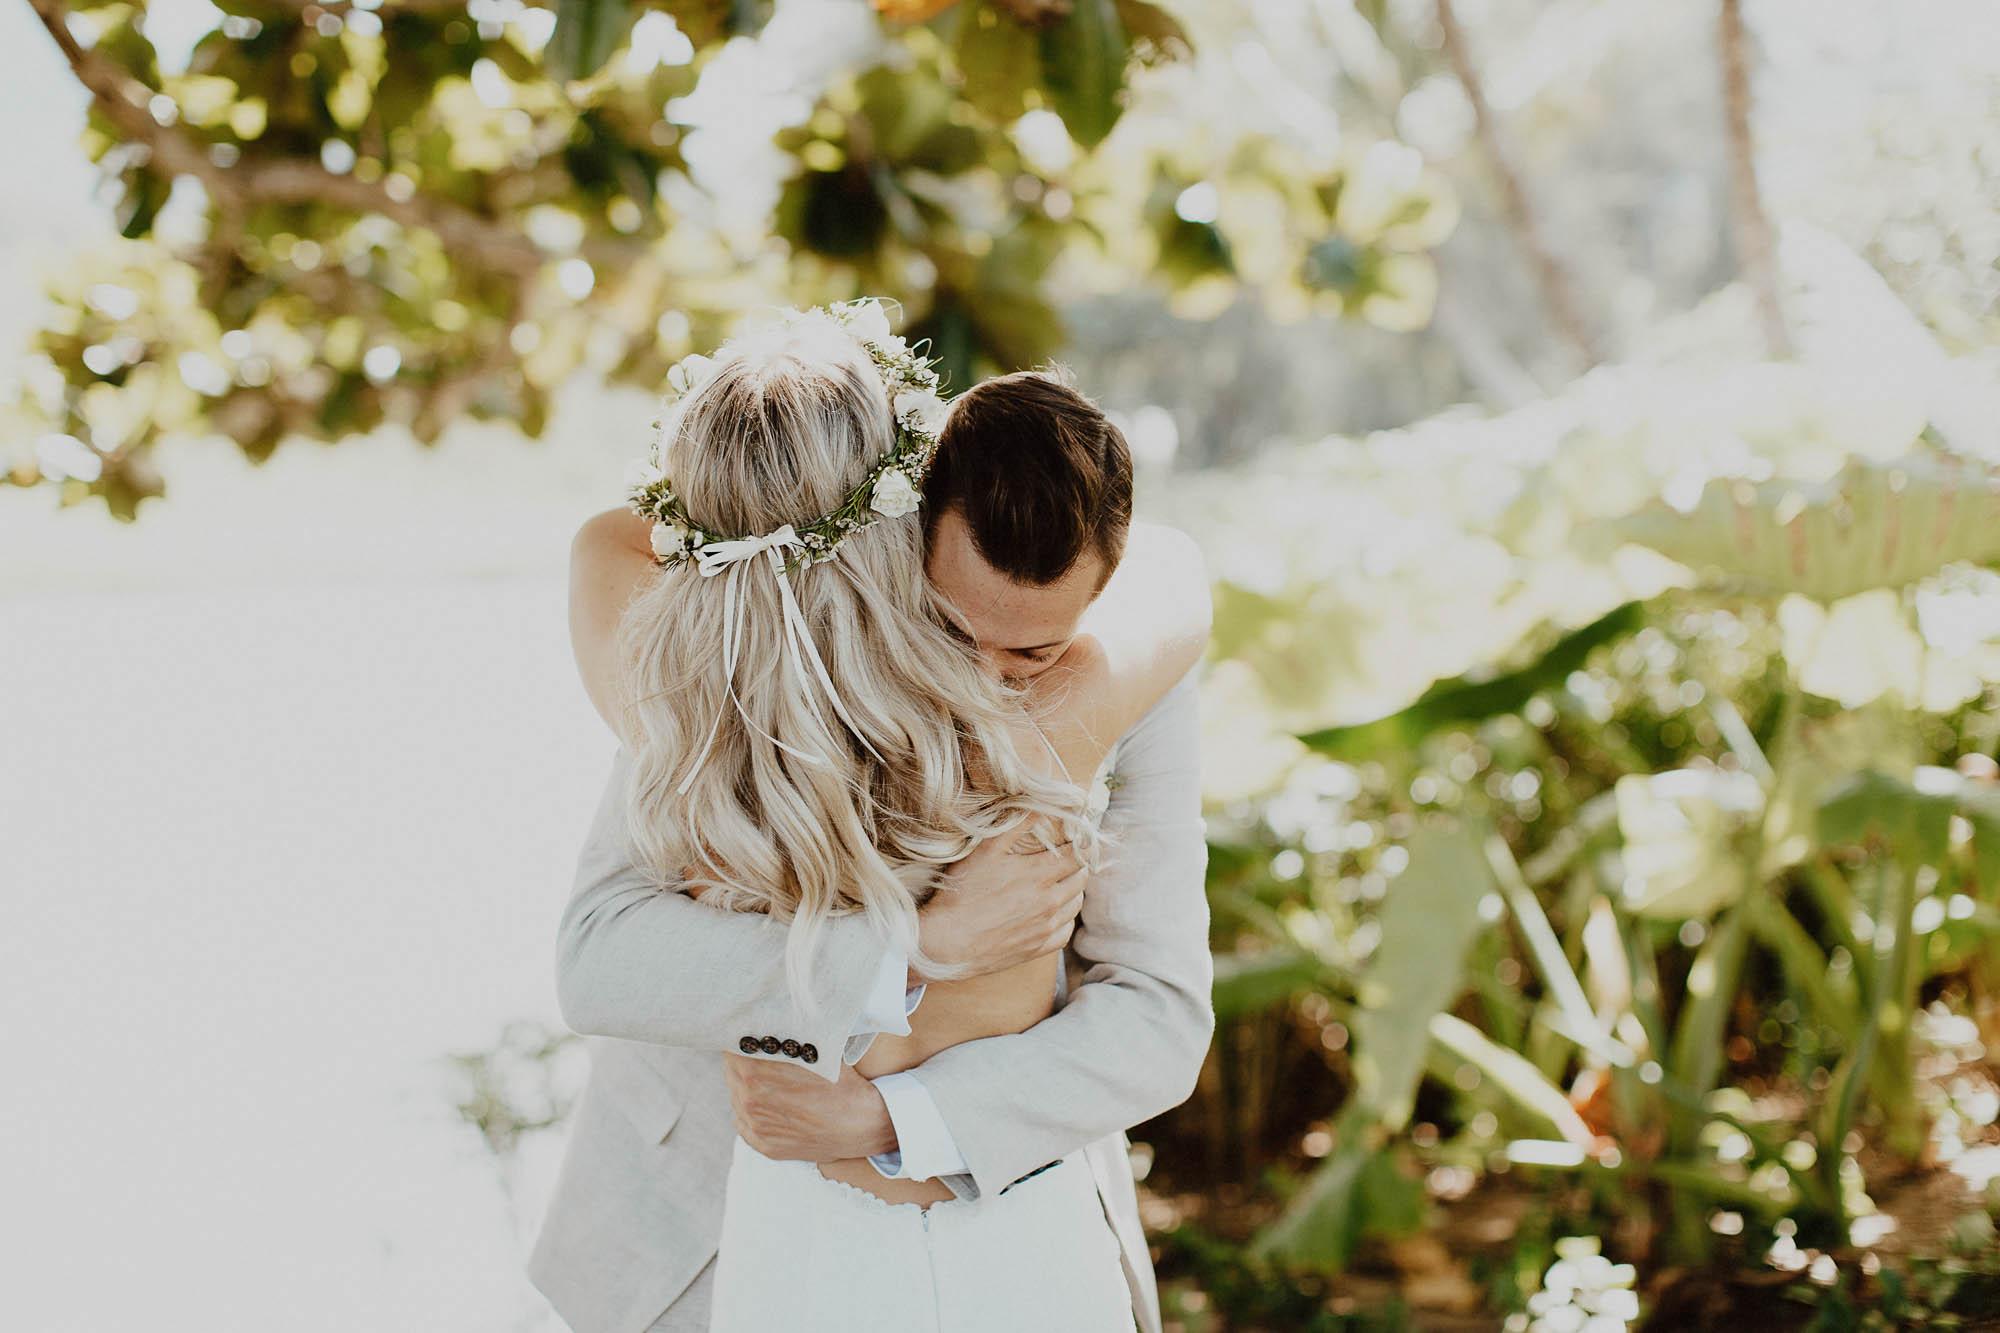 Wedding photos in paradise backless dress hanalei north shore kauai hawaii